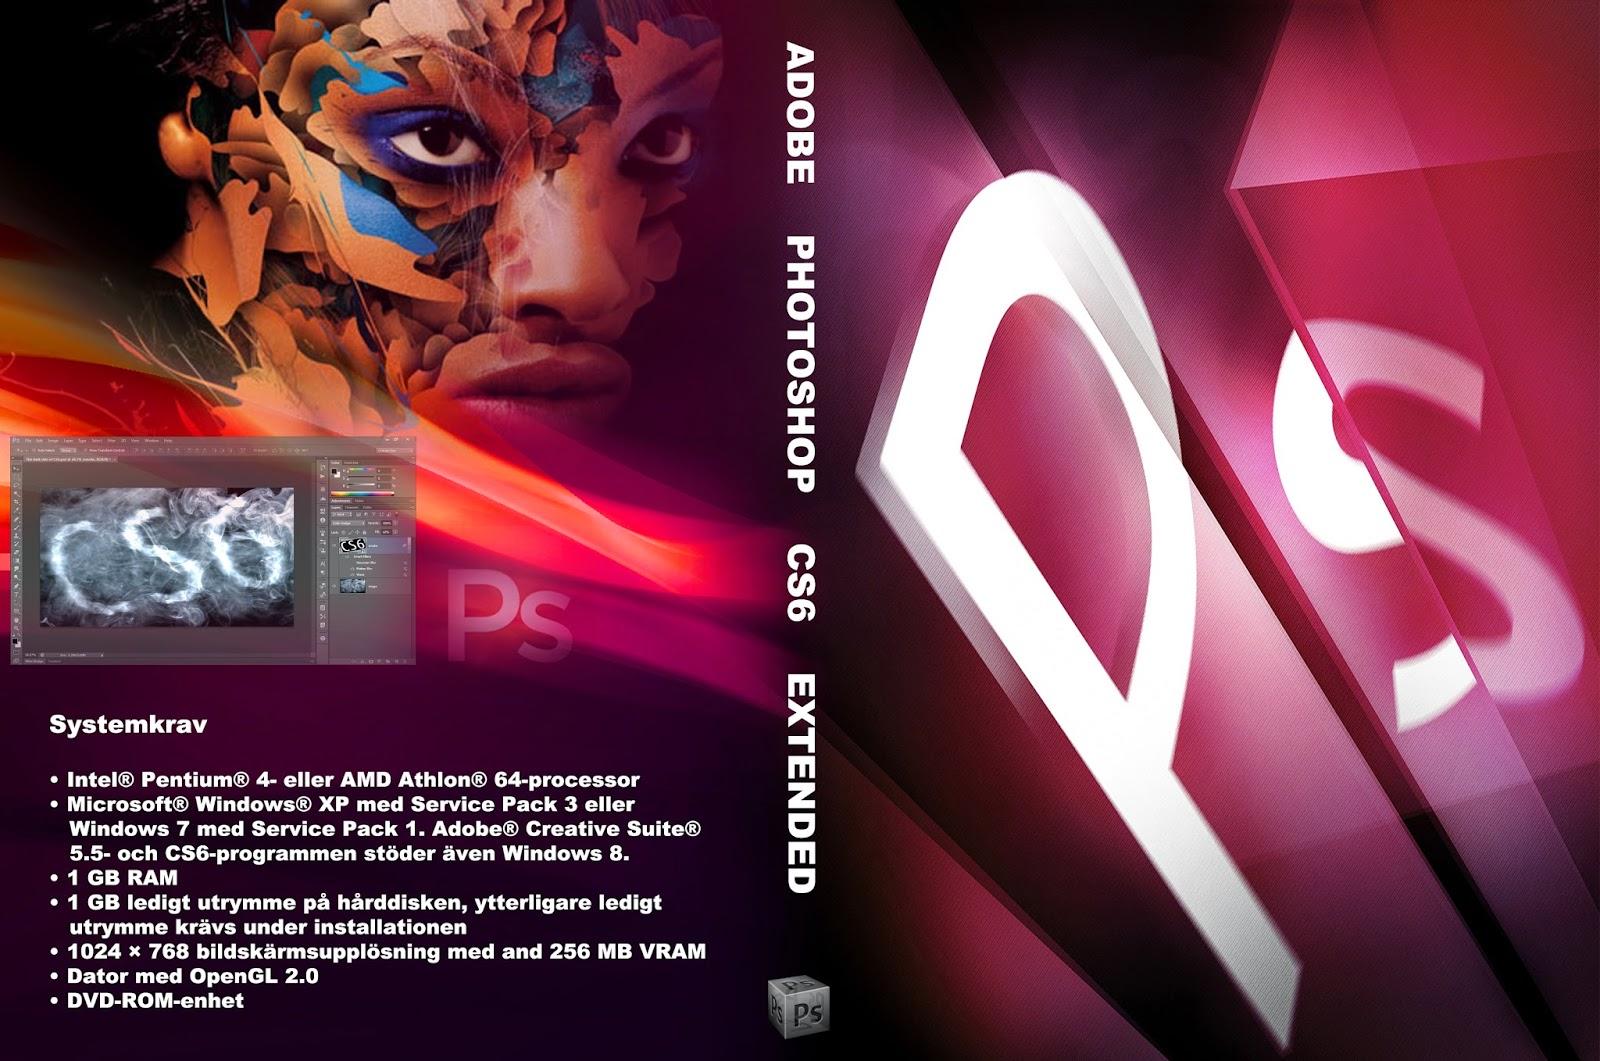 Download Adobe Photoshop CS6 Crack Full Version